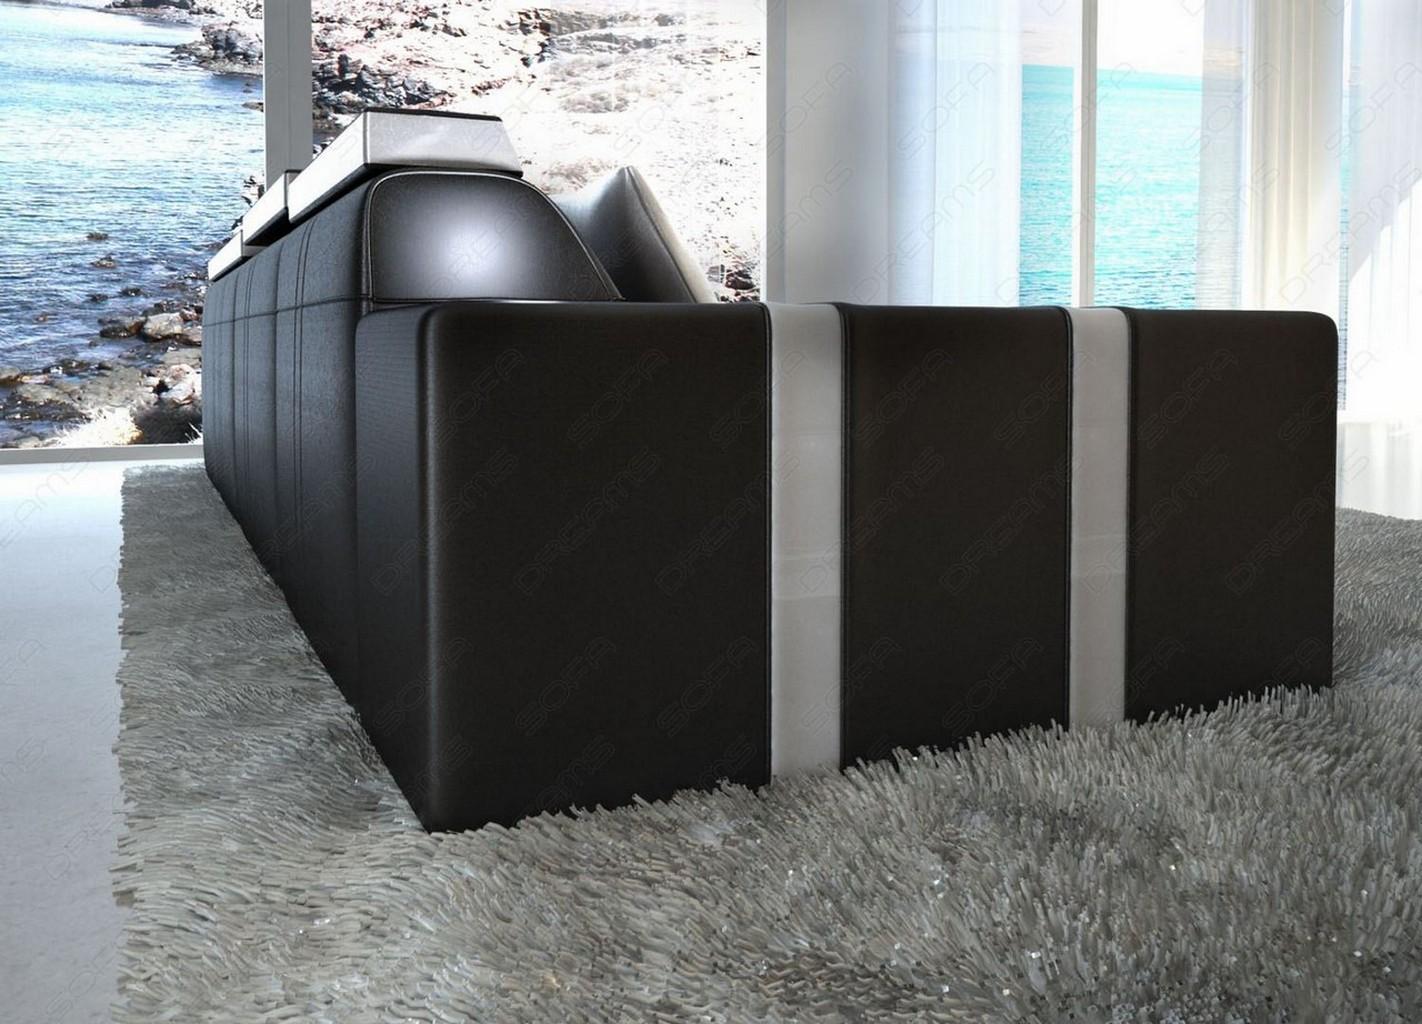 ledersofa asti l form schwarz weiss mit beleuchtung. Black Bedroom Furniture Sets. Home Design Ideas